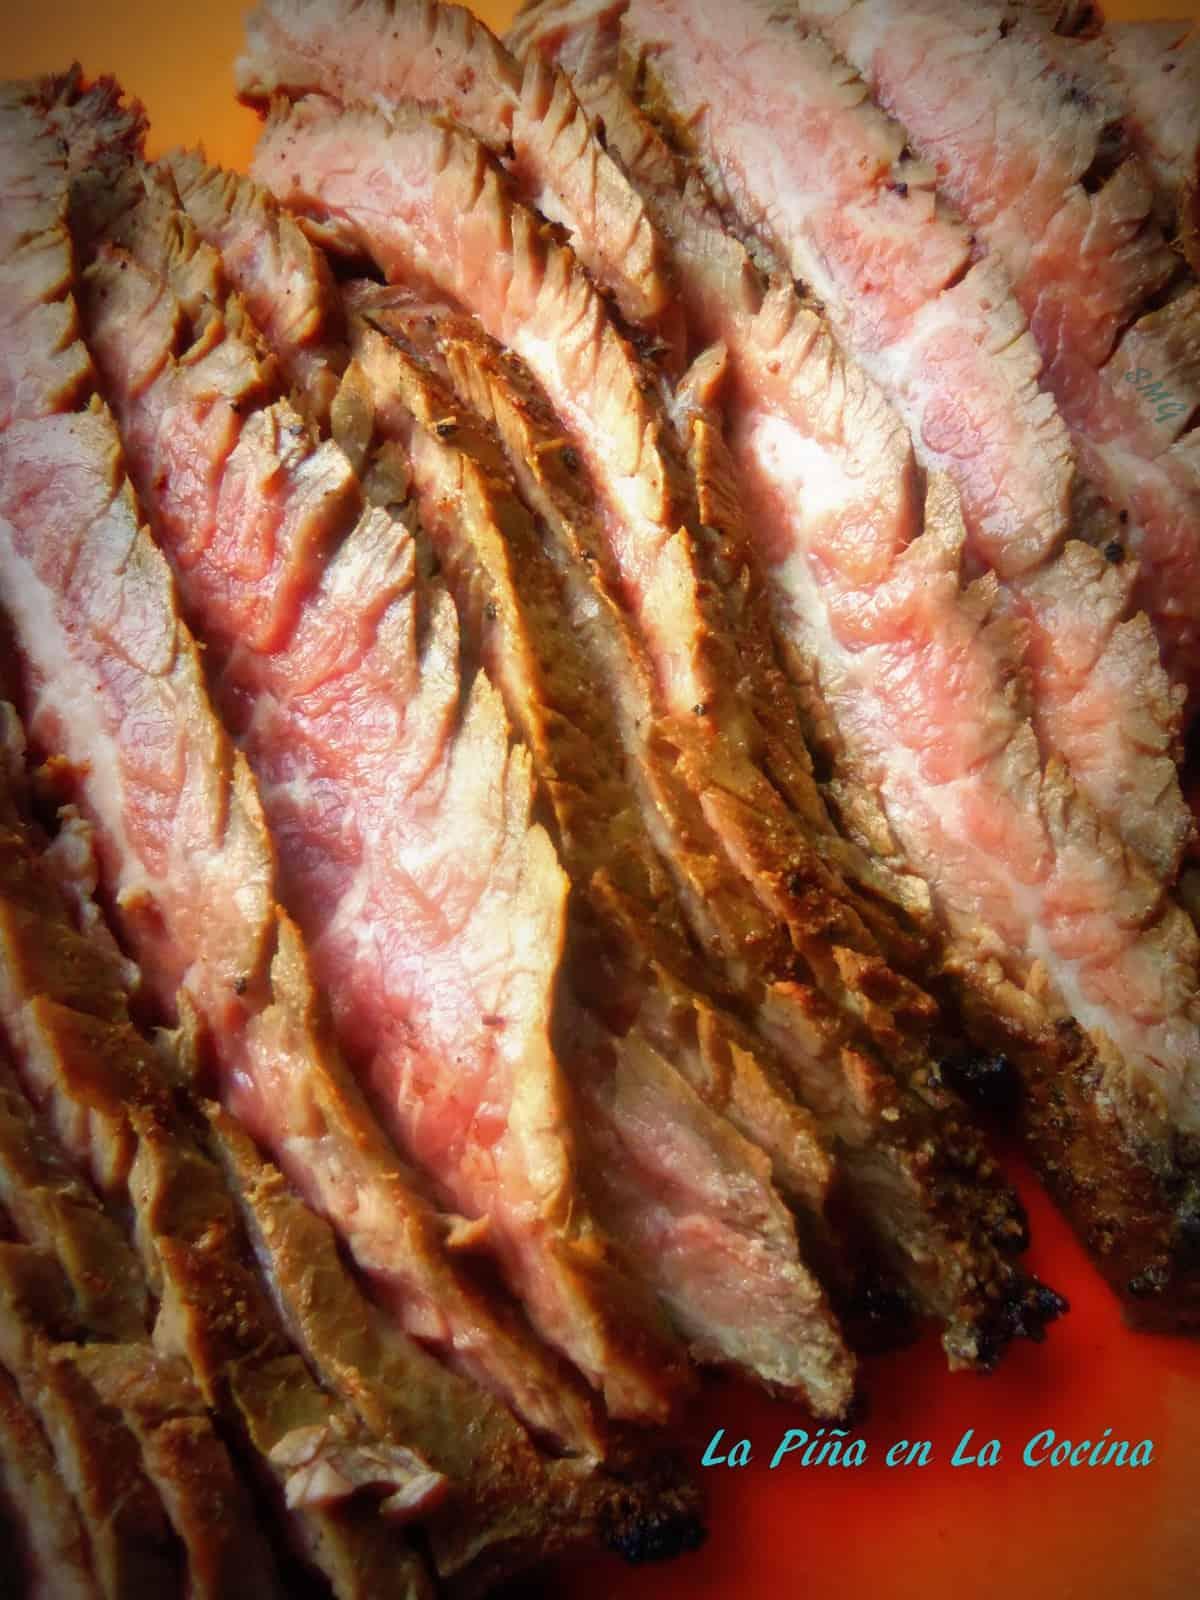 Flank Steak on the Coals